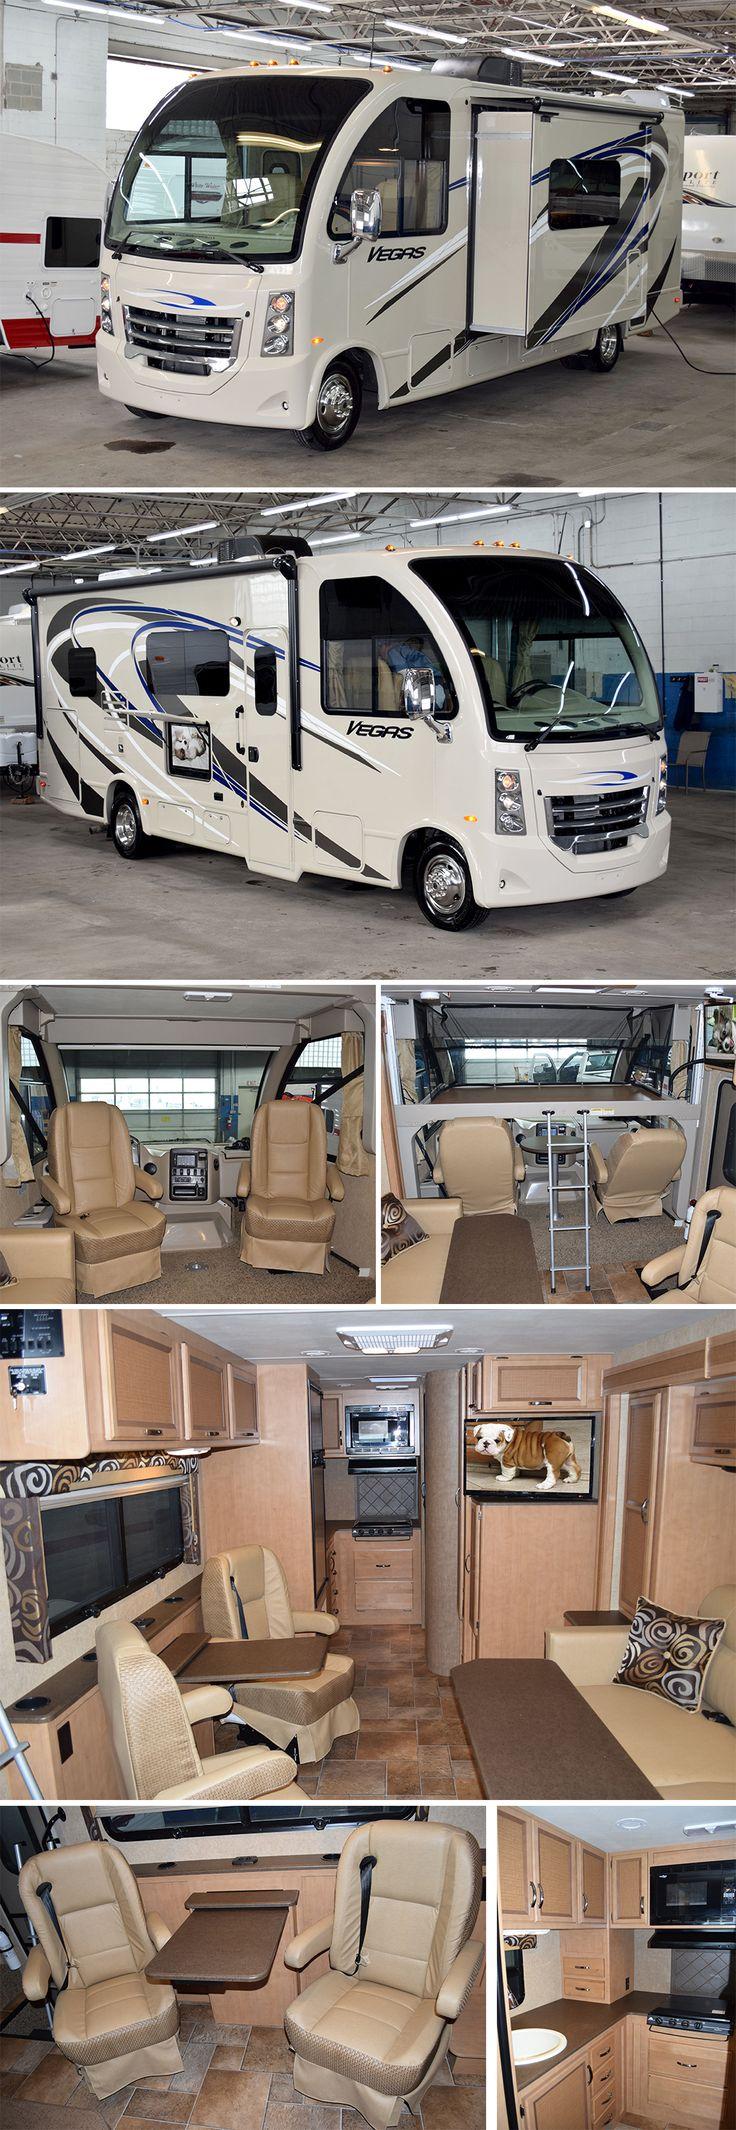 2015 thor motor coach vegas swm1282 luxury rv small